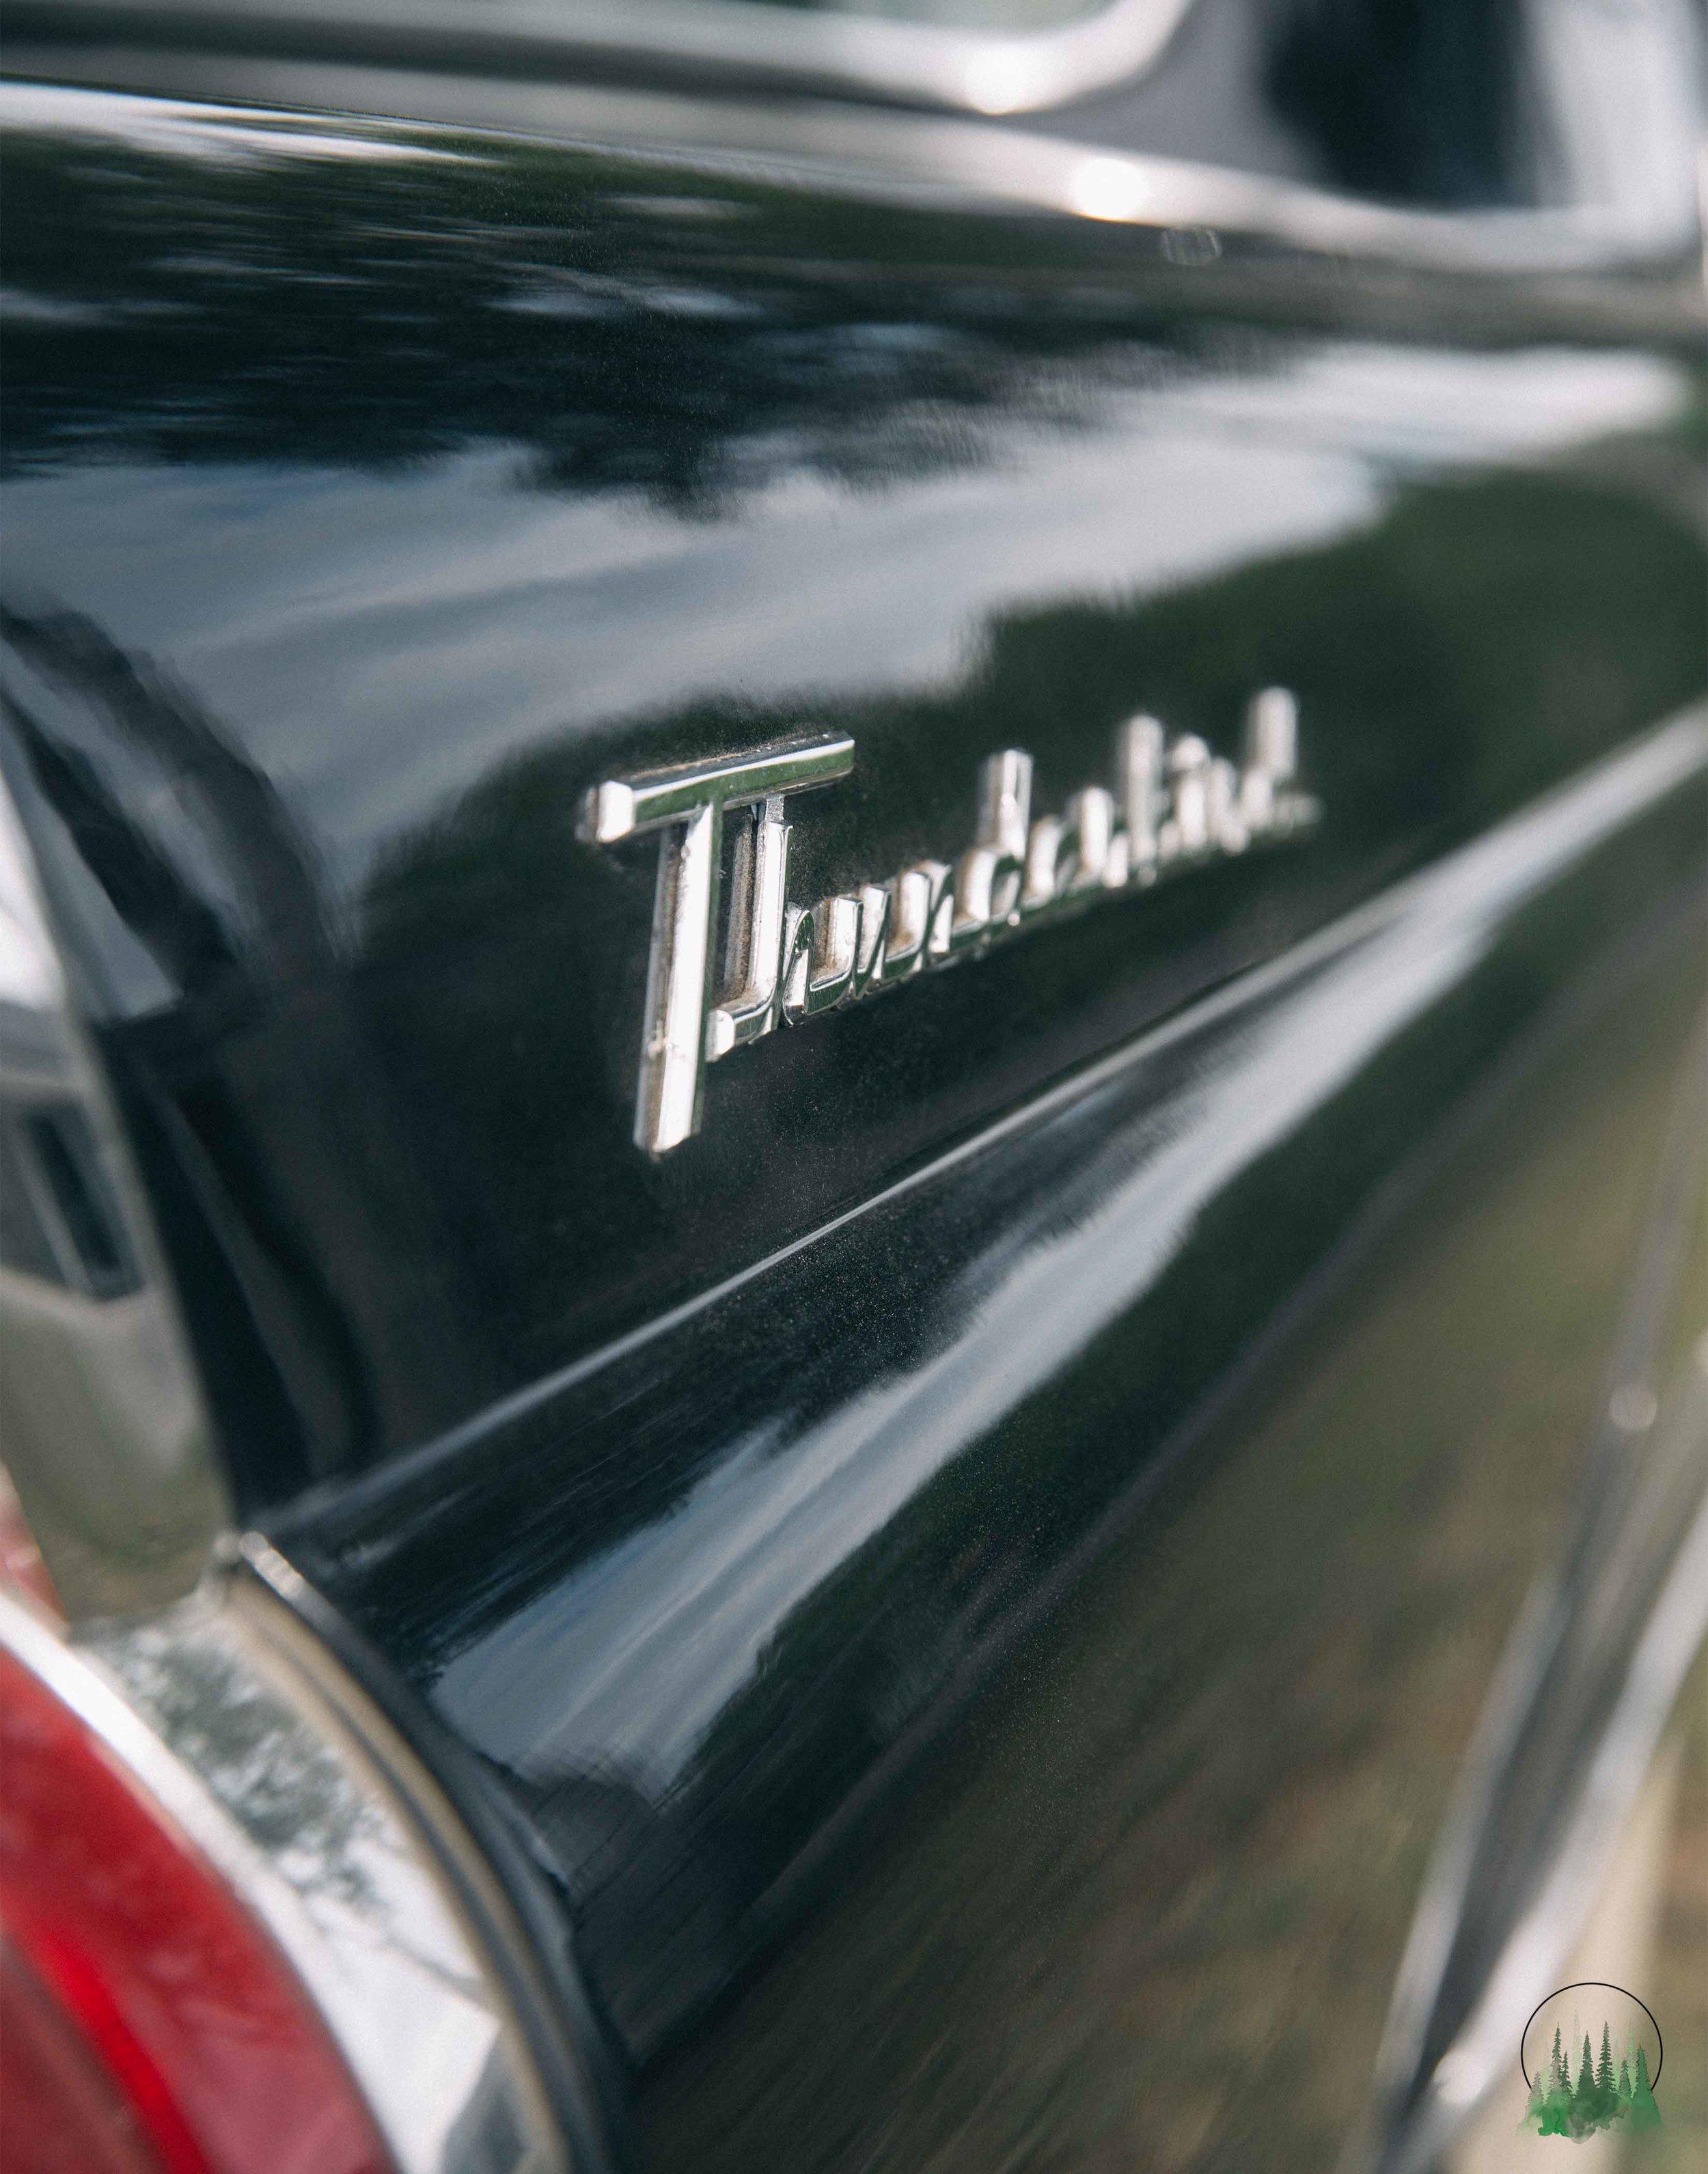 Thunderbird-11sig.jpg